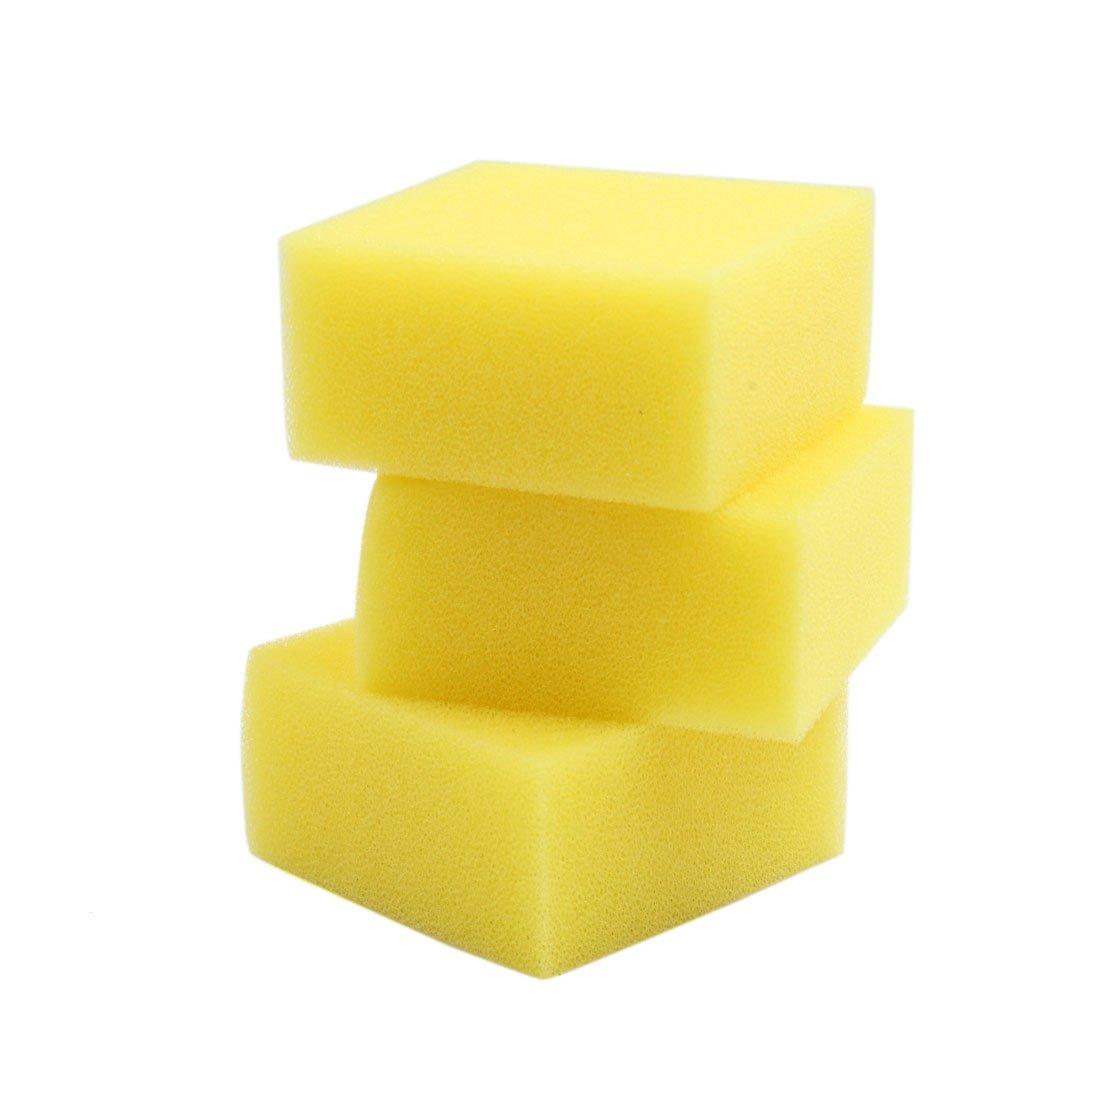 Uxcell® 3 Pcs 3.74x3.74x1.77 Inch Yellow Filter Cartridge Sponge Replacement for Aquarium